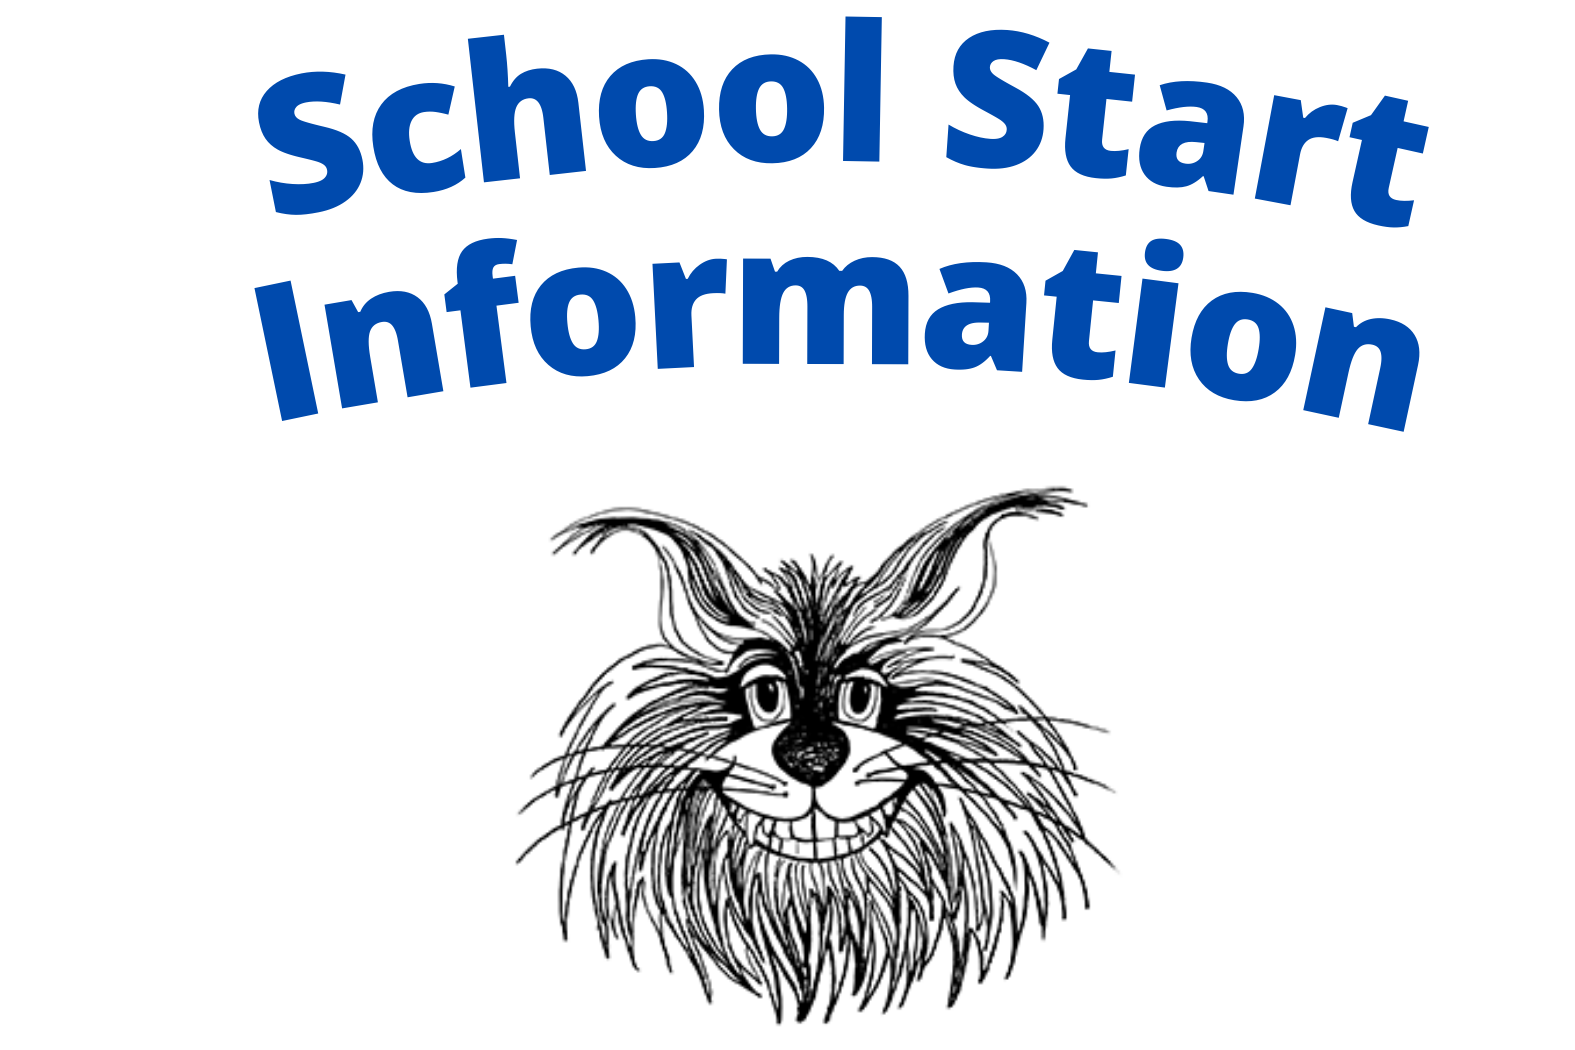 School start info